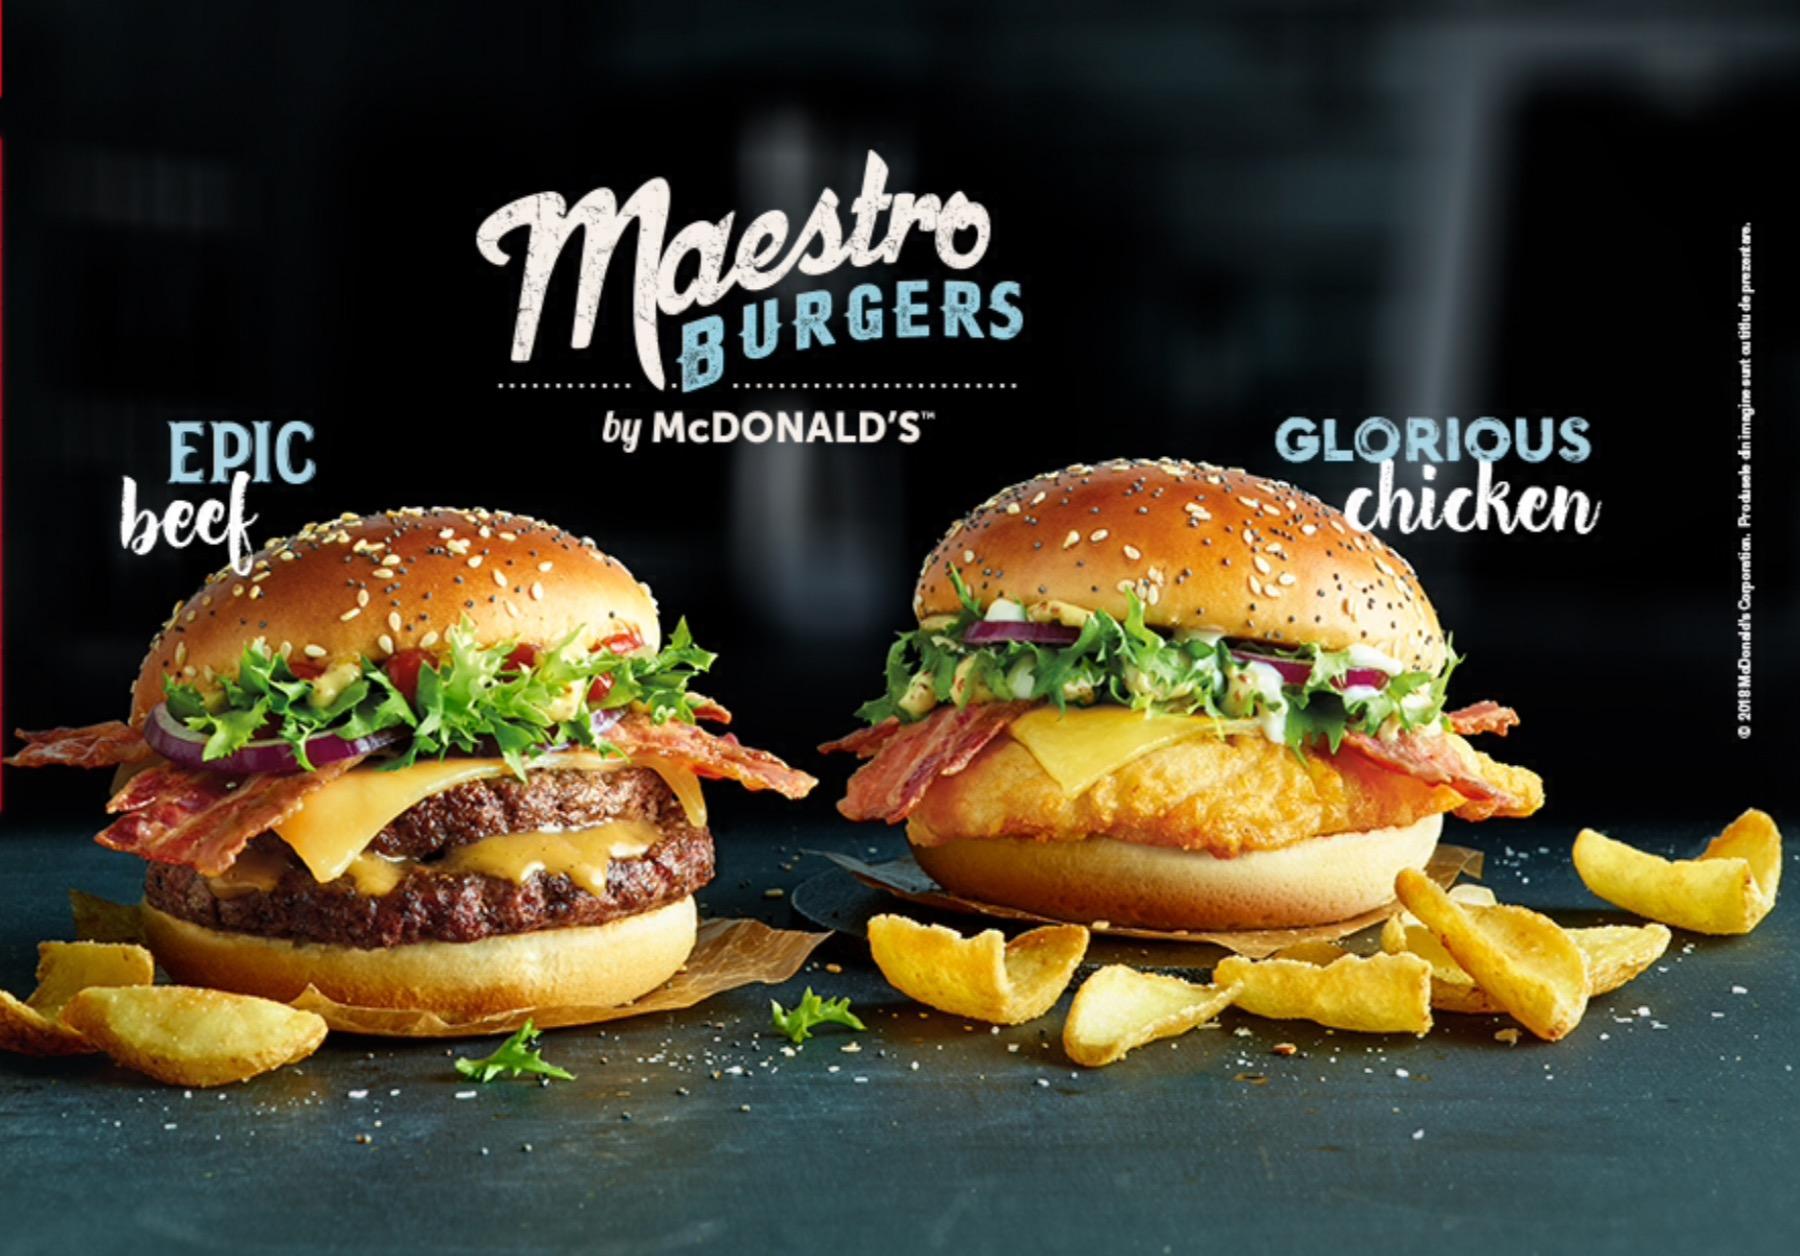 McDonald's Maestro Burgers - Romania - Epic Beef & Glorious Chicken